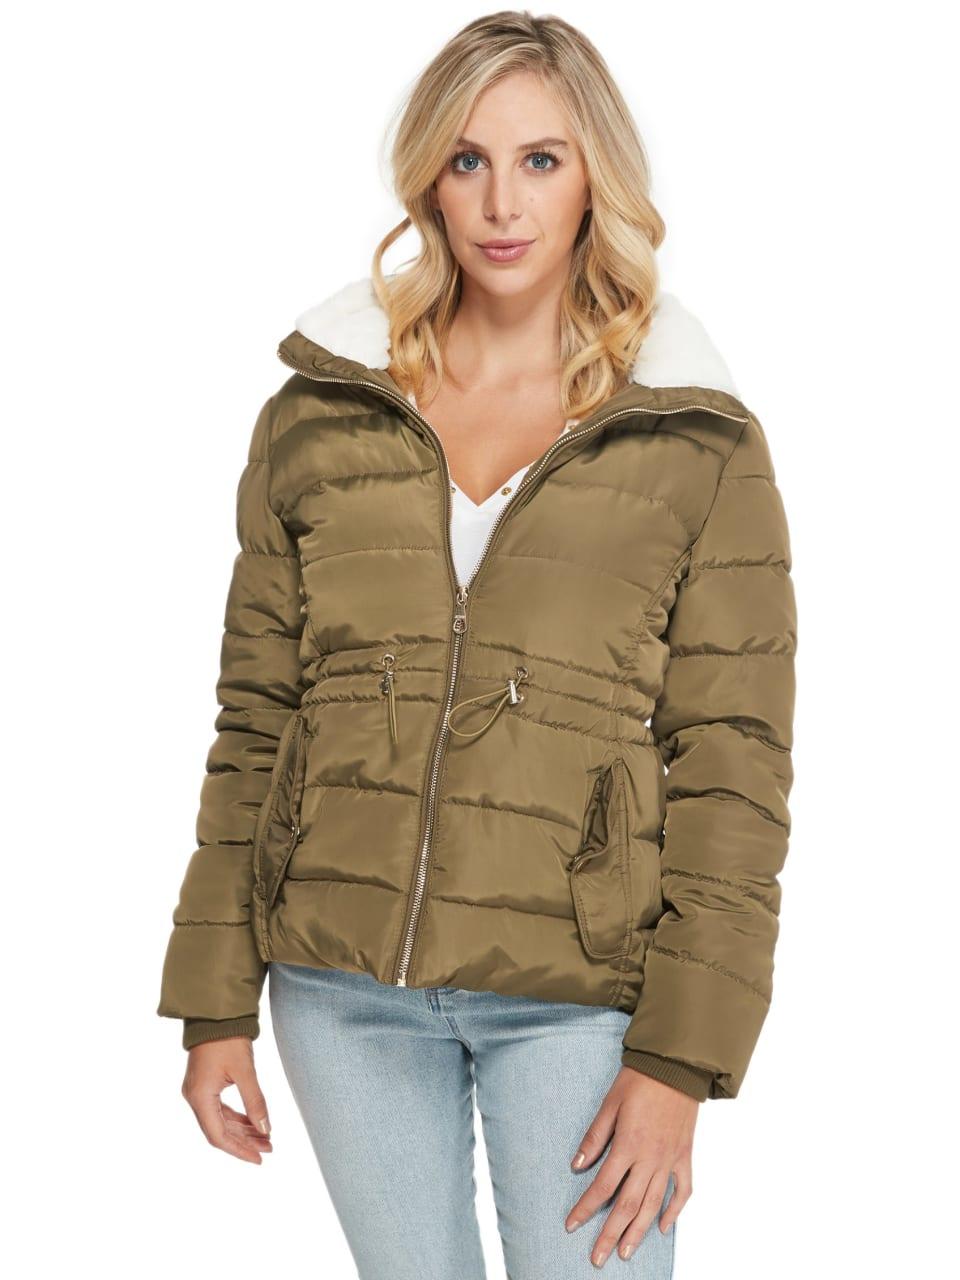 GUESS Factory Glimmer Faux-Fur Trim Puffer Jacket | eBay